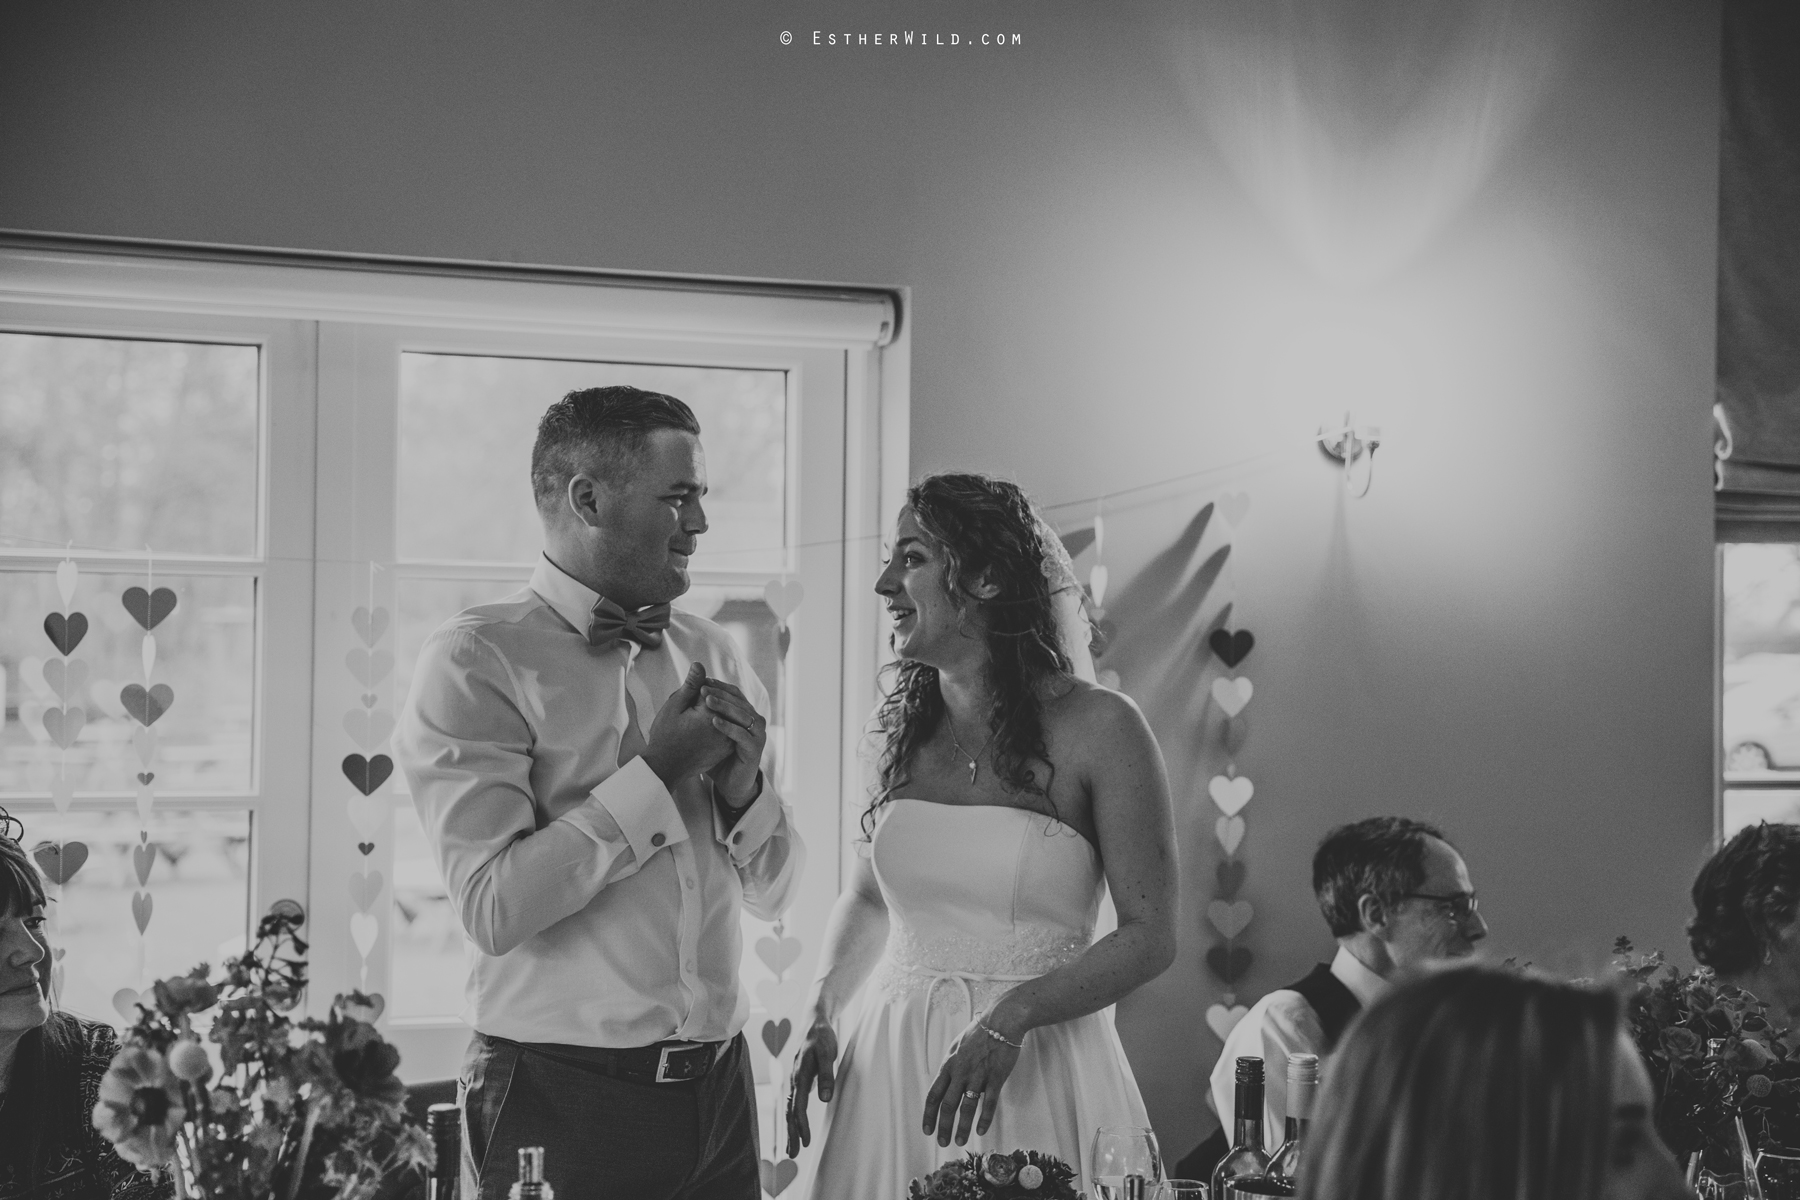 The_BoatHouse_Wedding_Venue_Ormesby_Norfolk_Broads_Boat_Wedding_Photography_Esther_Wild_Photographer_IMG_2497-2.jpg